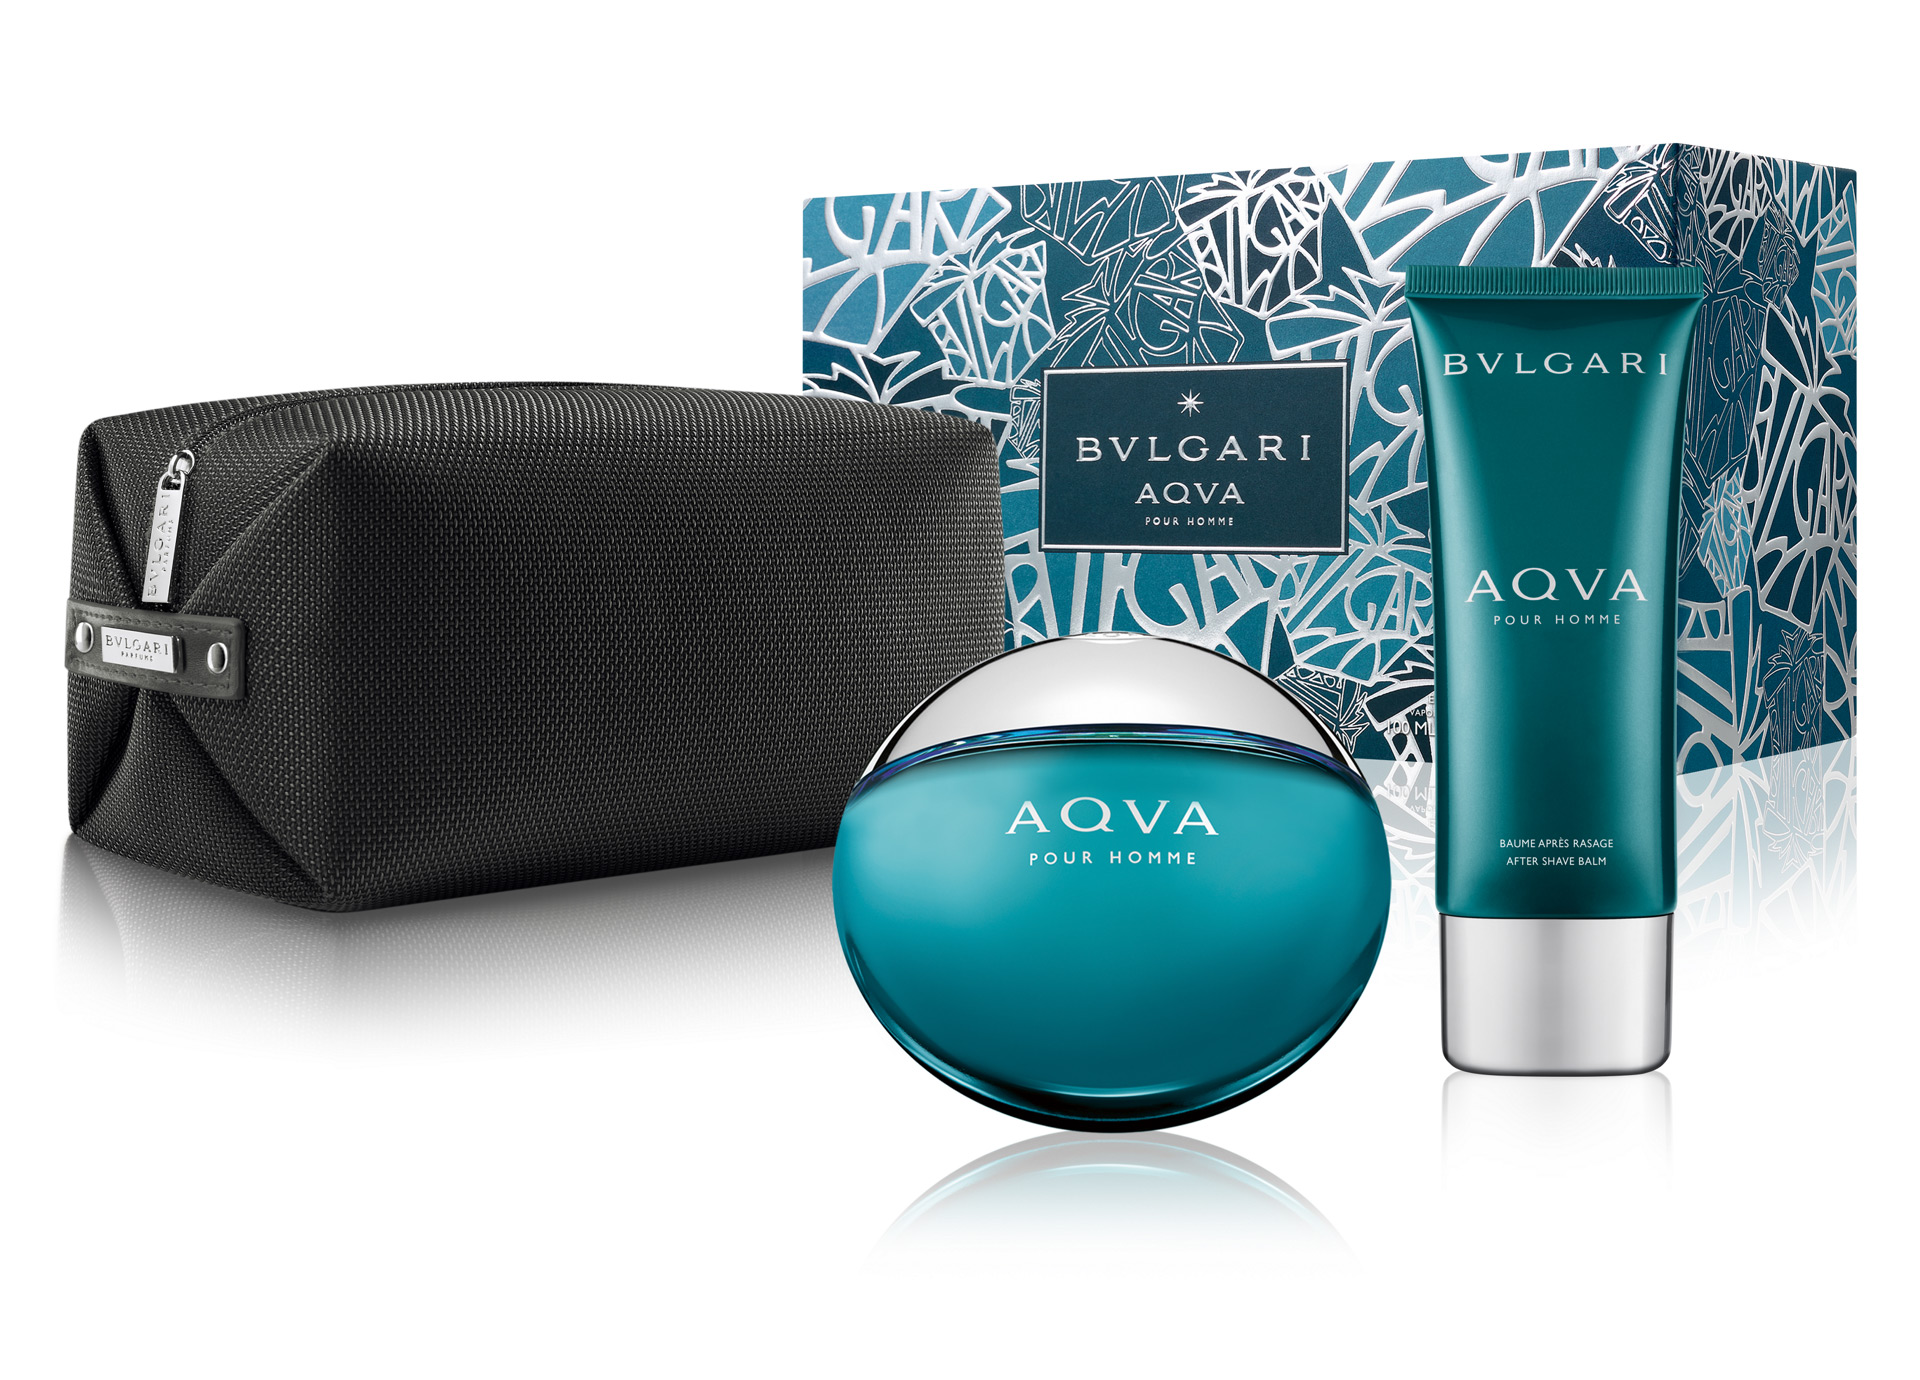 BVLGARI 水能量香氛禮盒 (100ml淡香水+100ml鬍後乳+盥洗包)